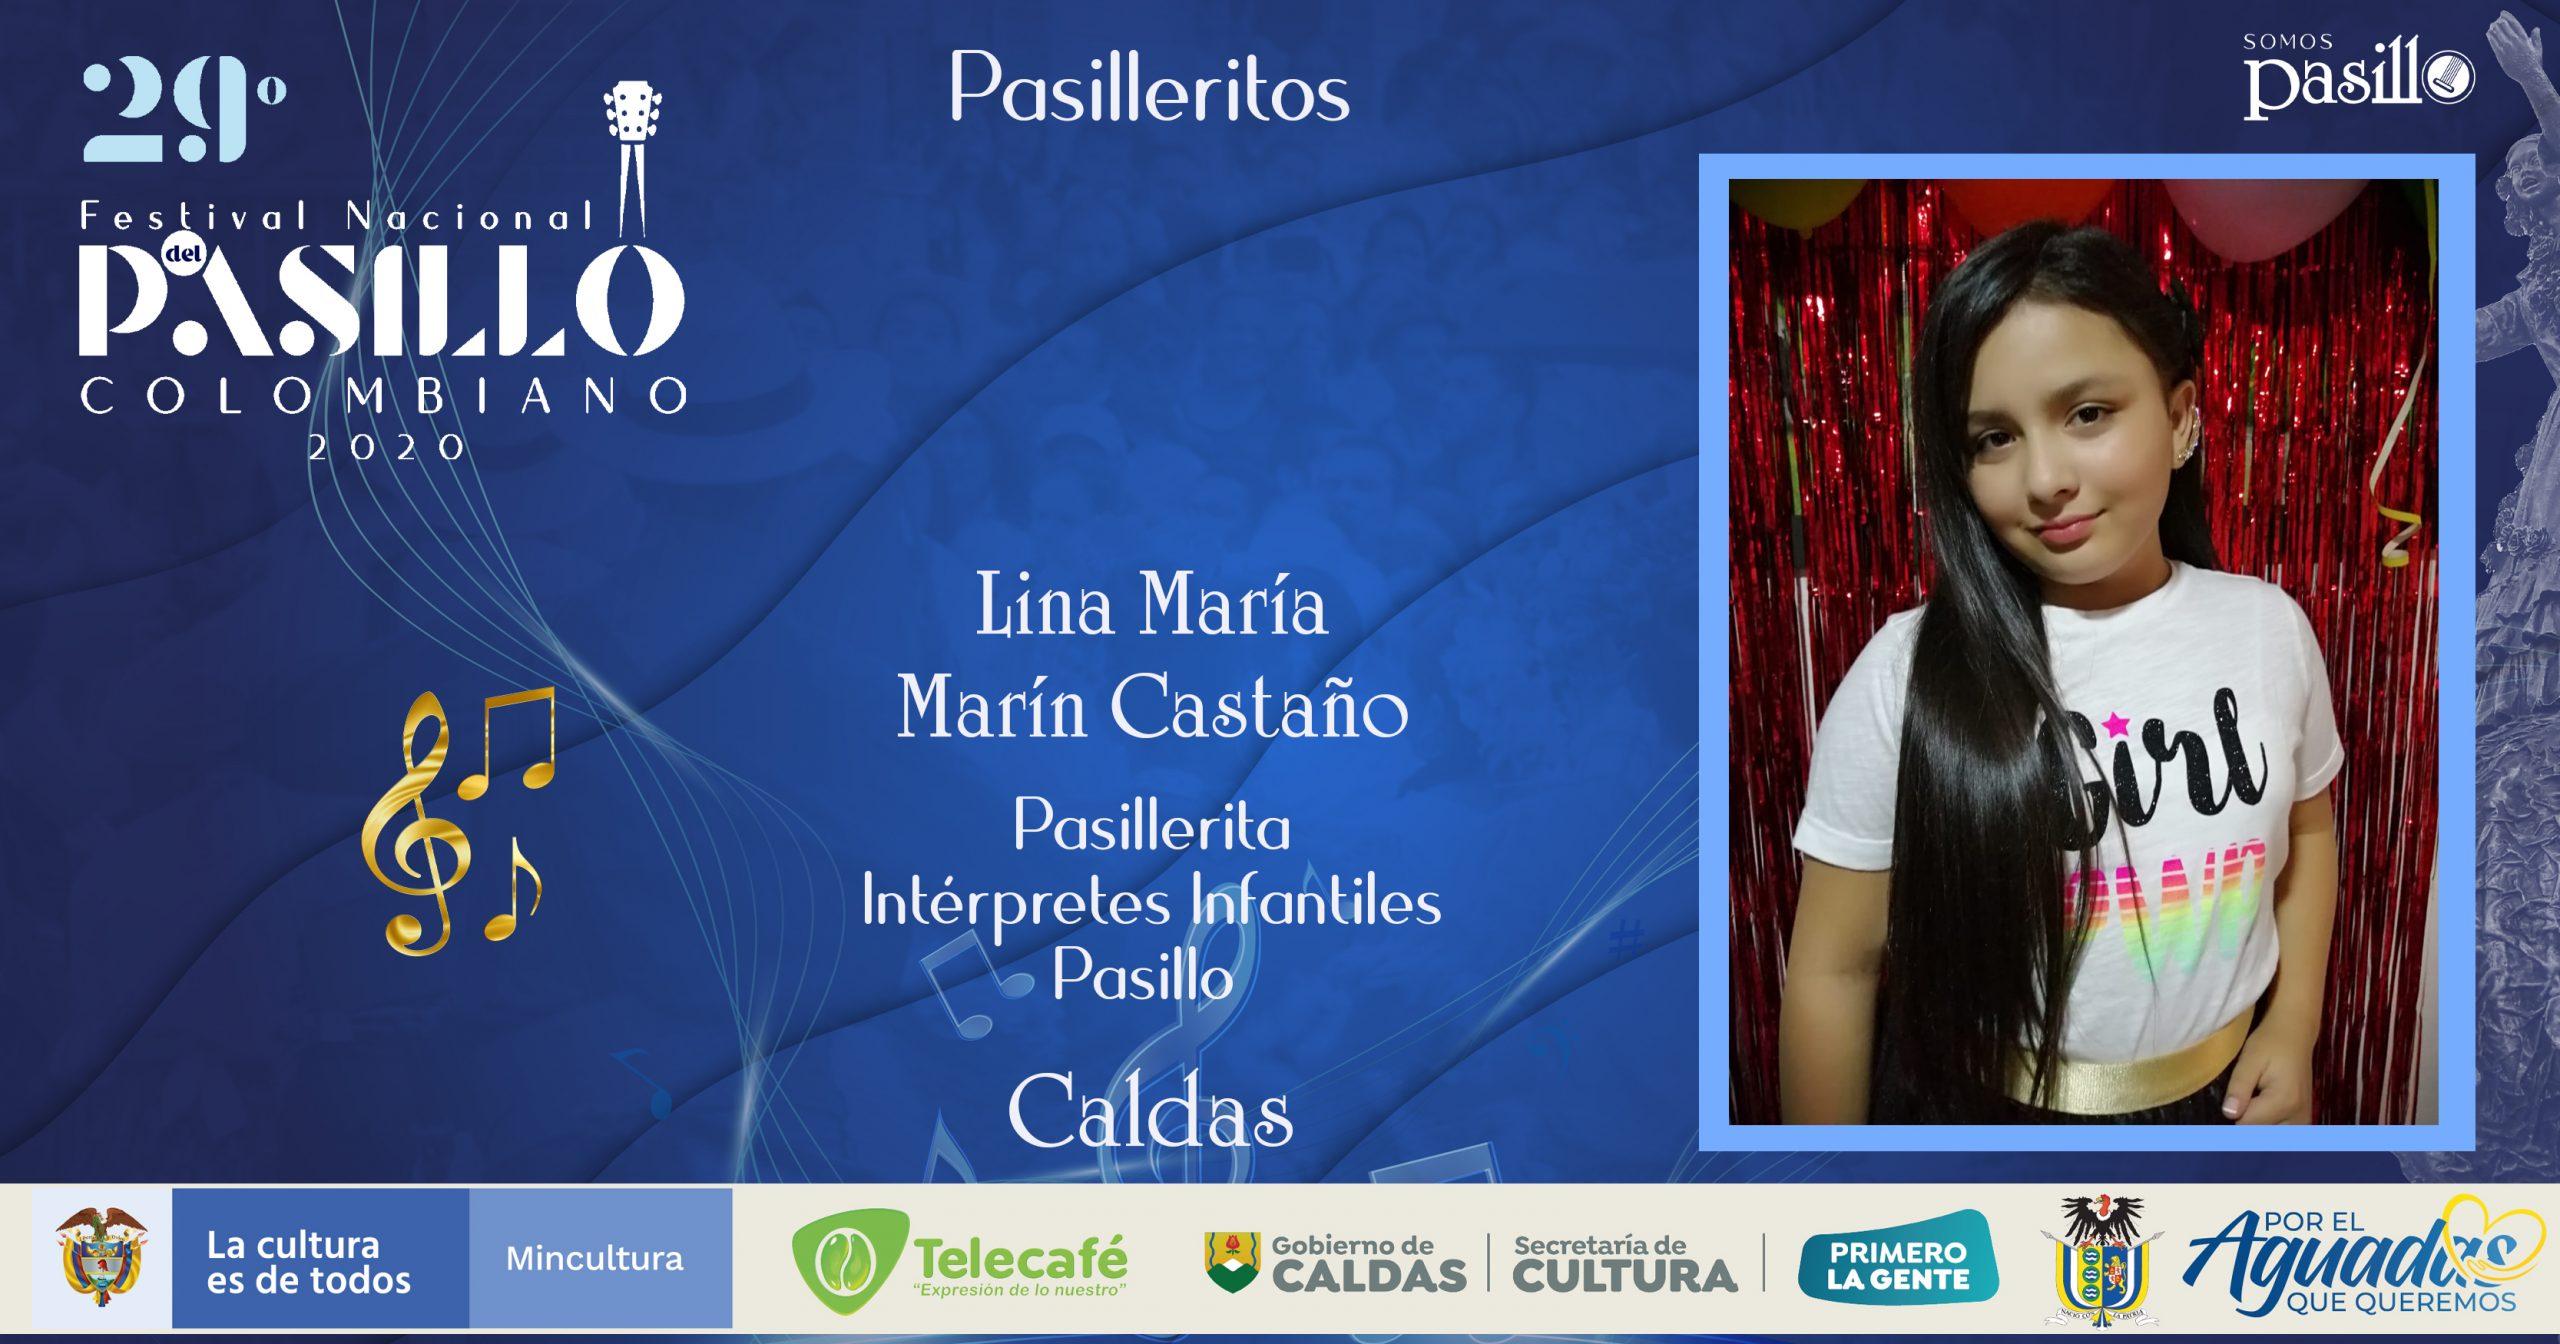 Lina María Marín Castaño